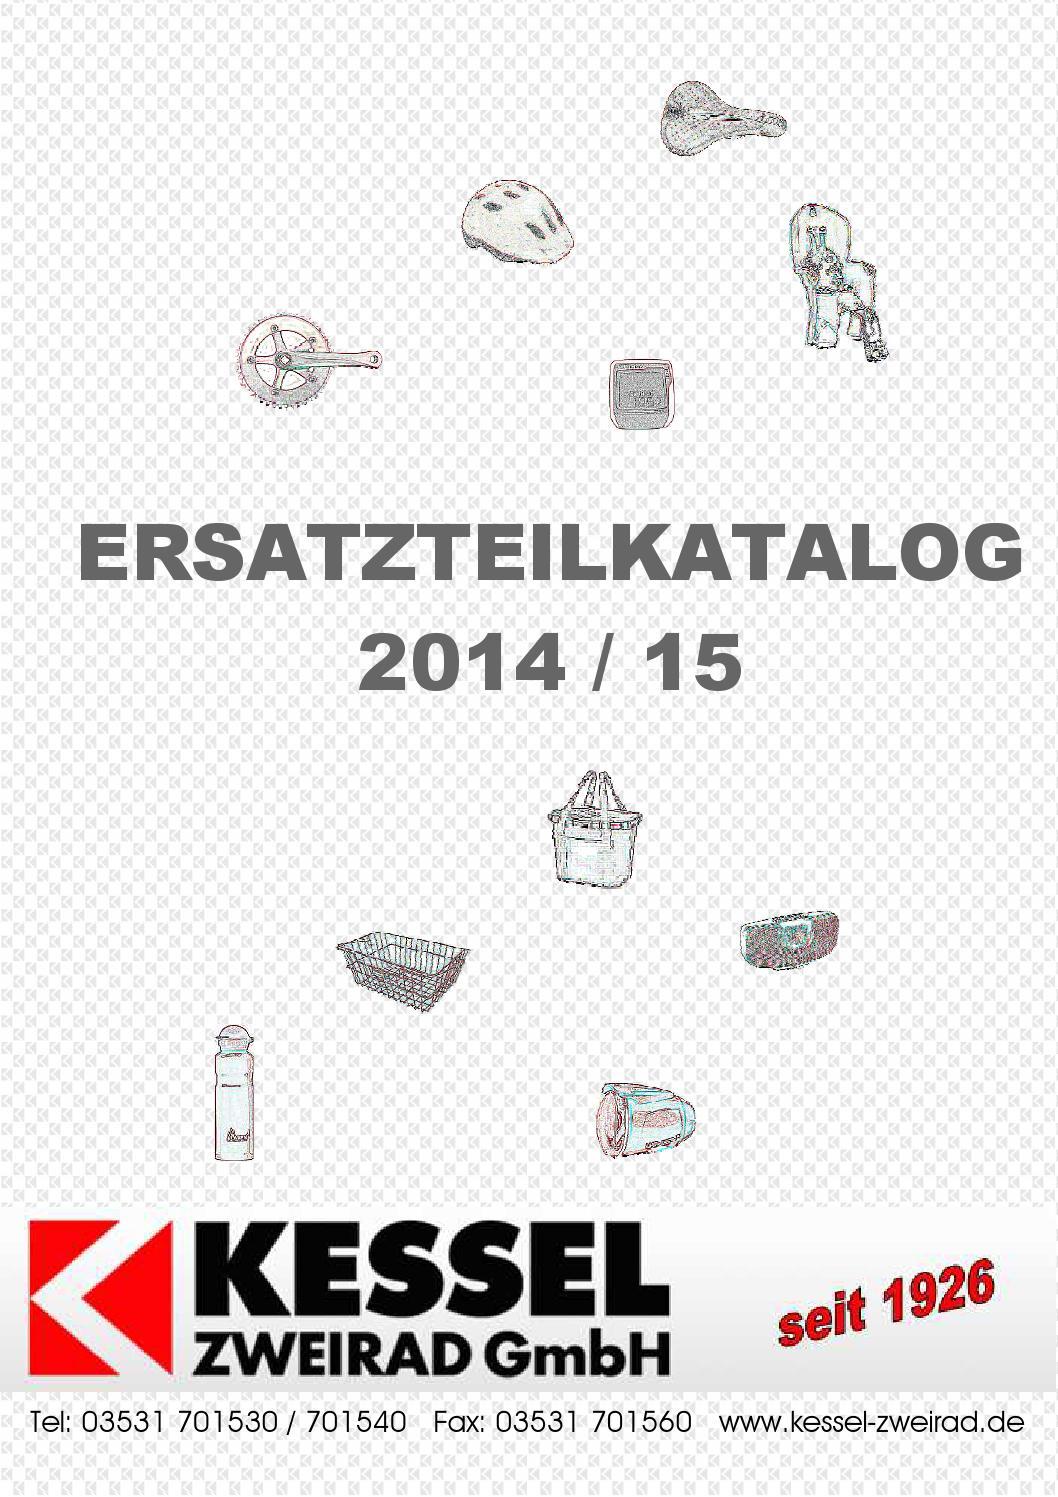 Ersatzsteil Katalog 2014/15 Kessel Zweirad by Julian Winter - issuu